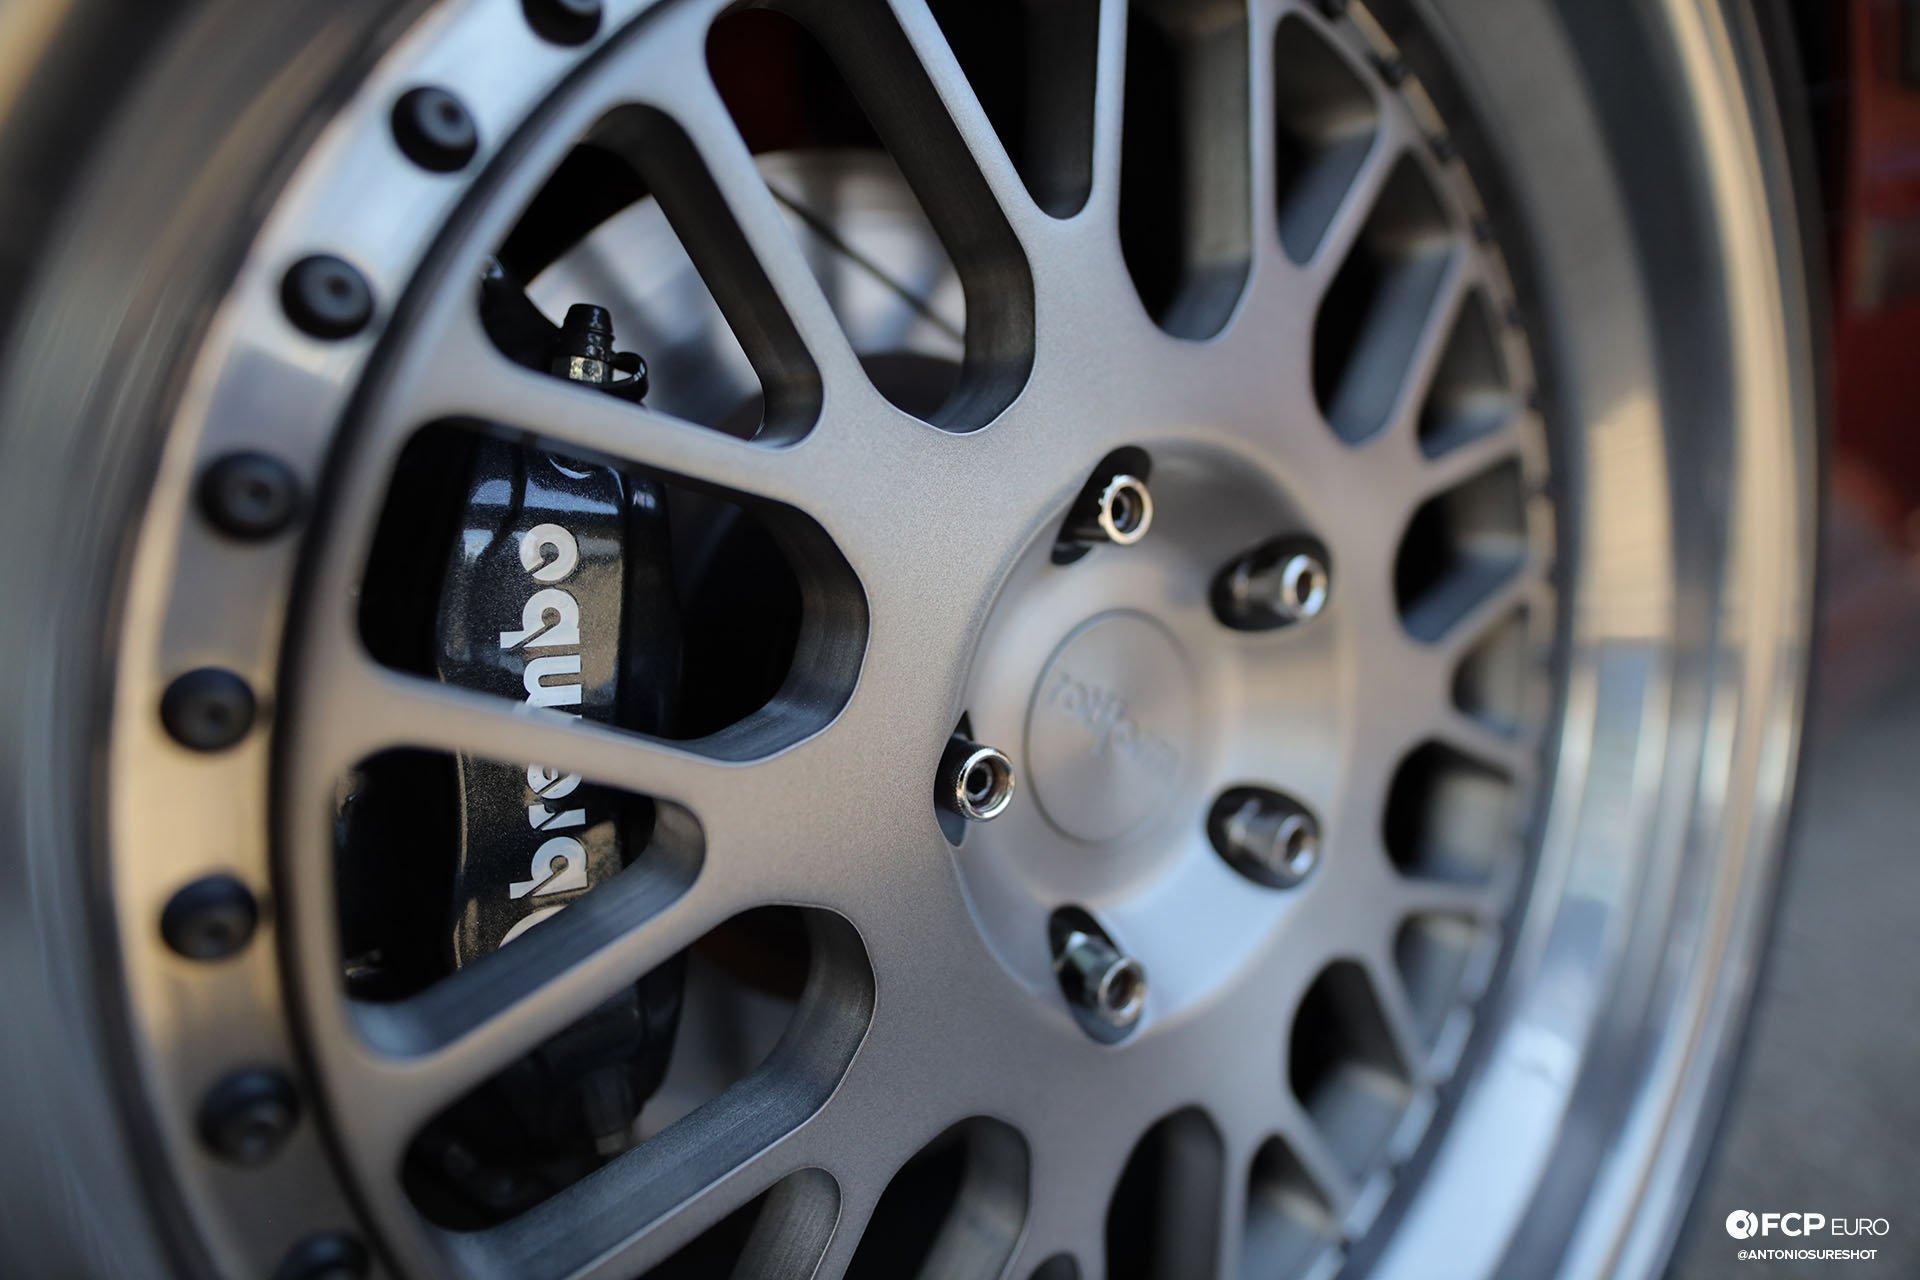 E34 BMW 540i M-Sport Rotiform Brembo Stoptech Hawk Performance